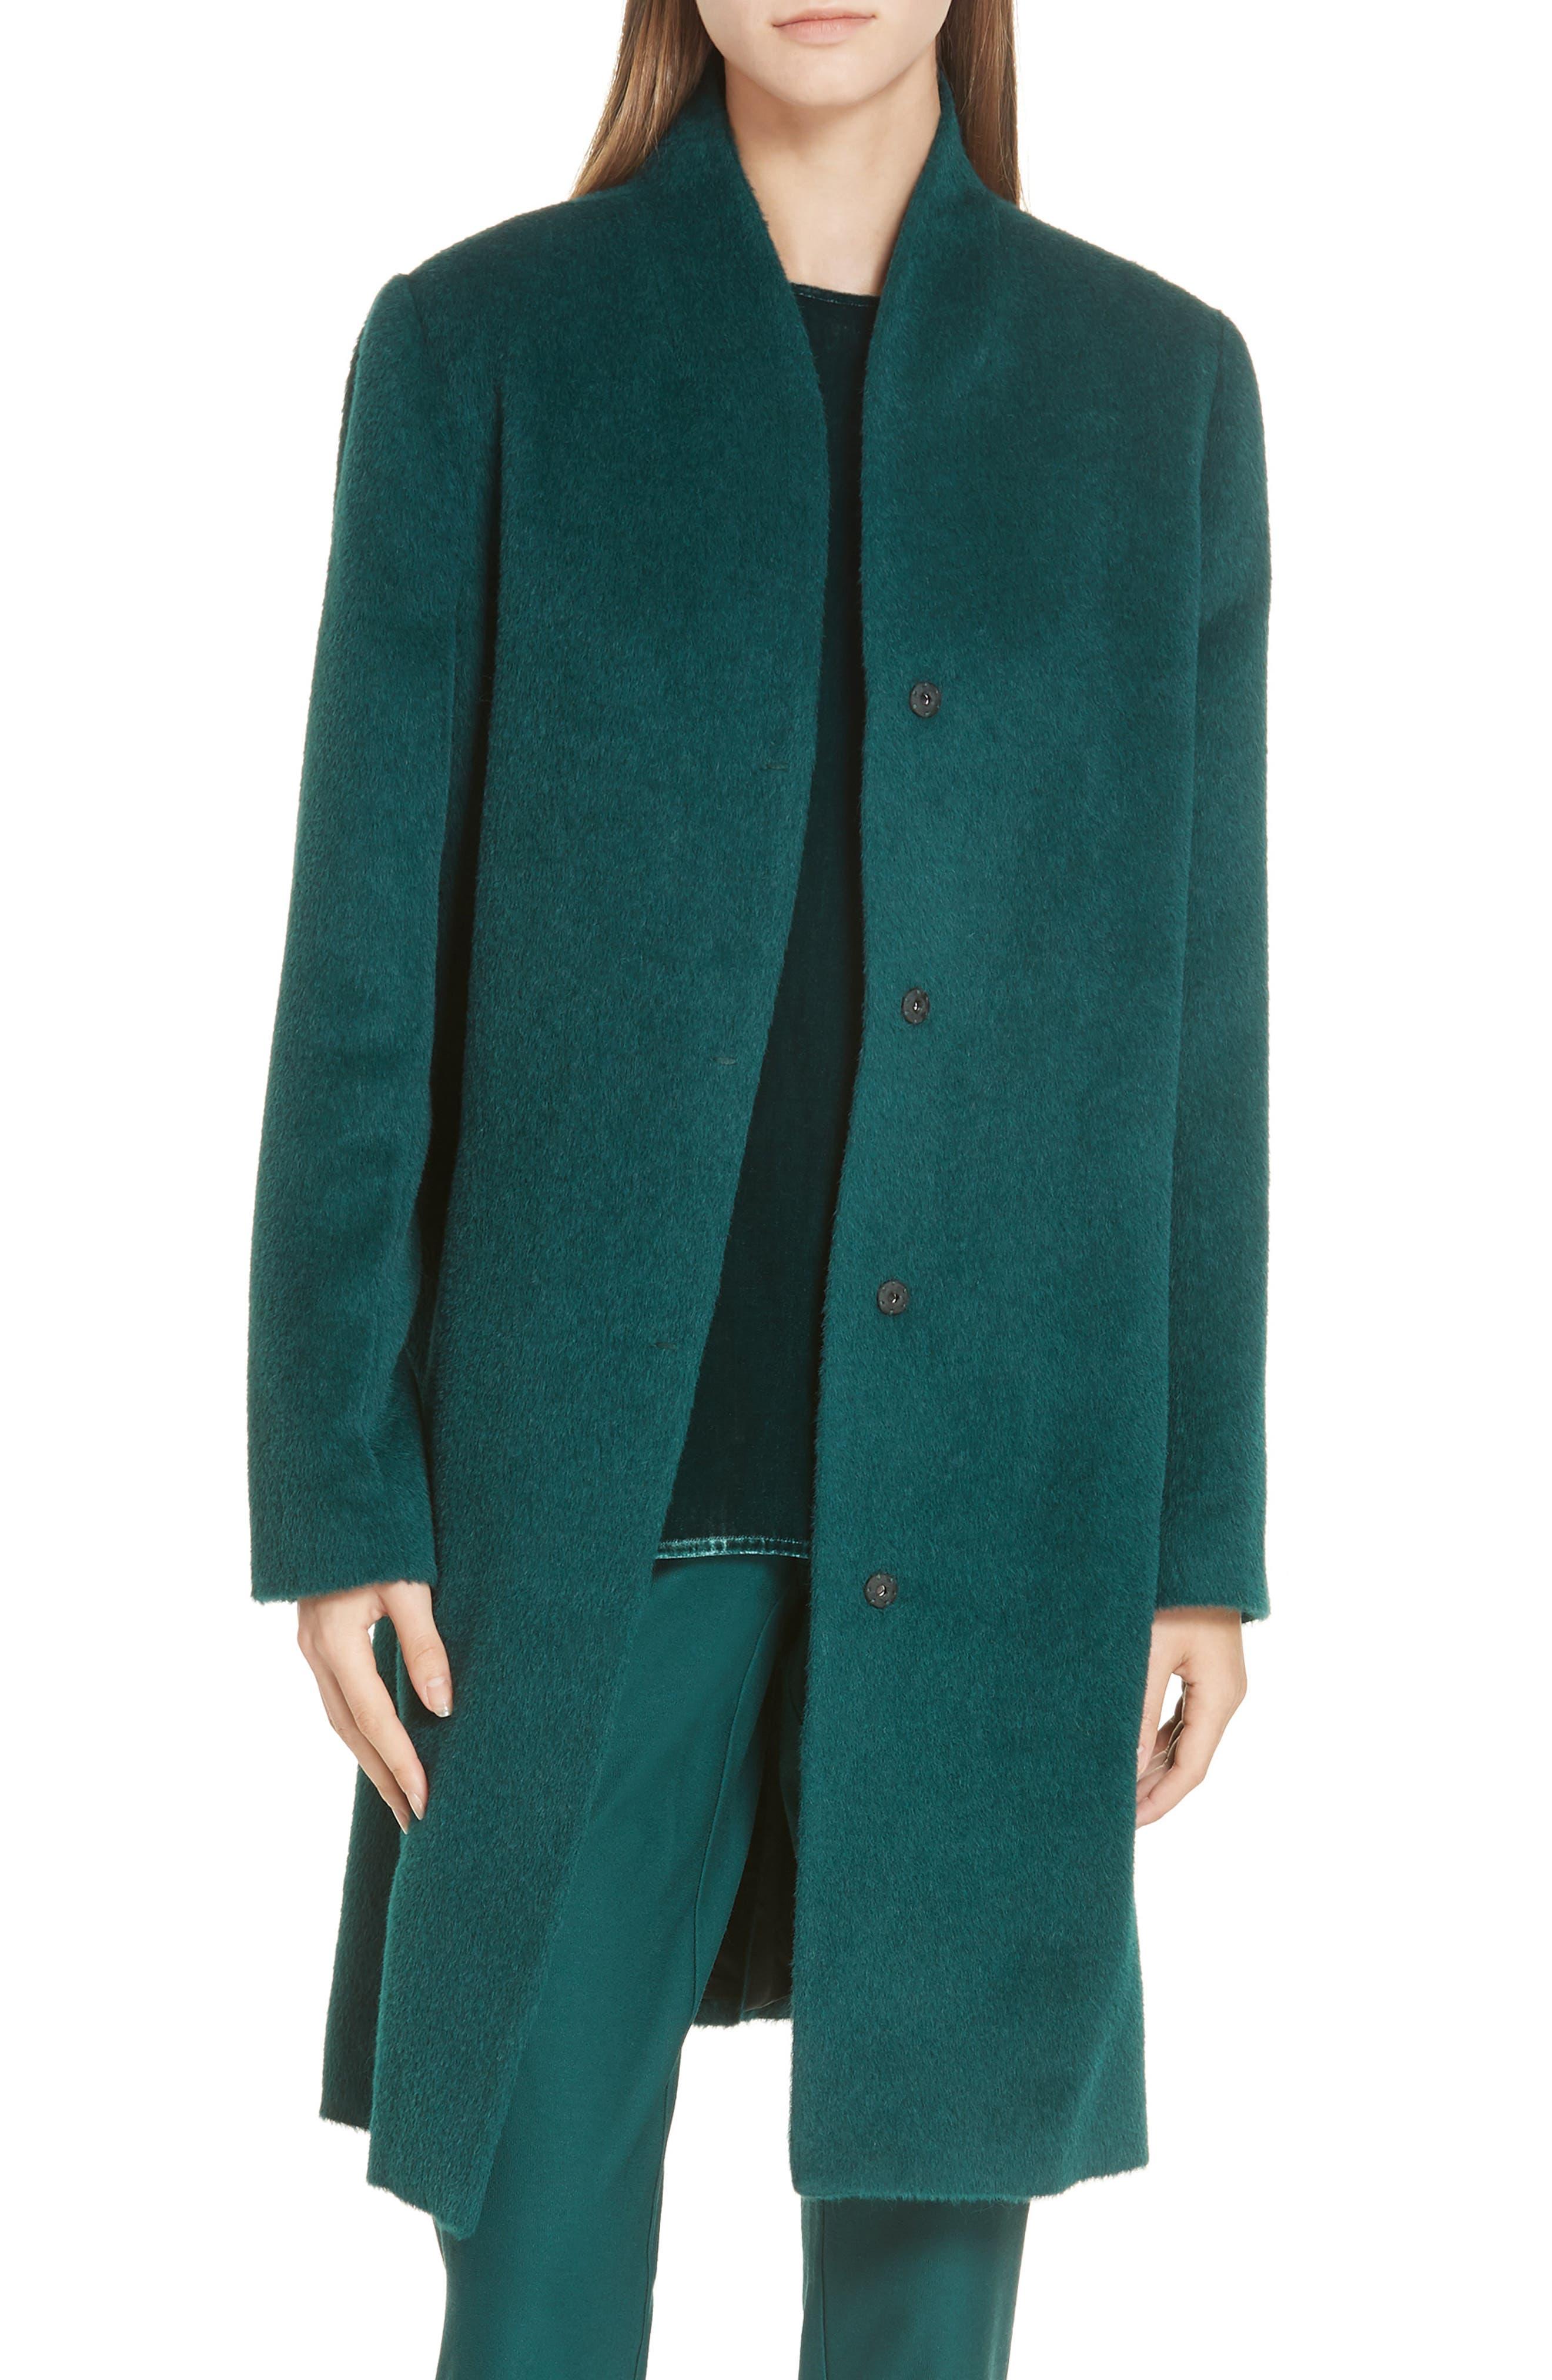 Suri Alpaca Blend Coat,                             Main thumbnail 1, color,                             PINE